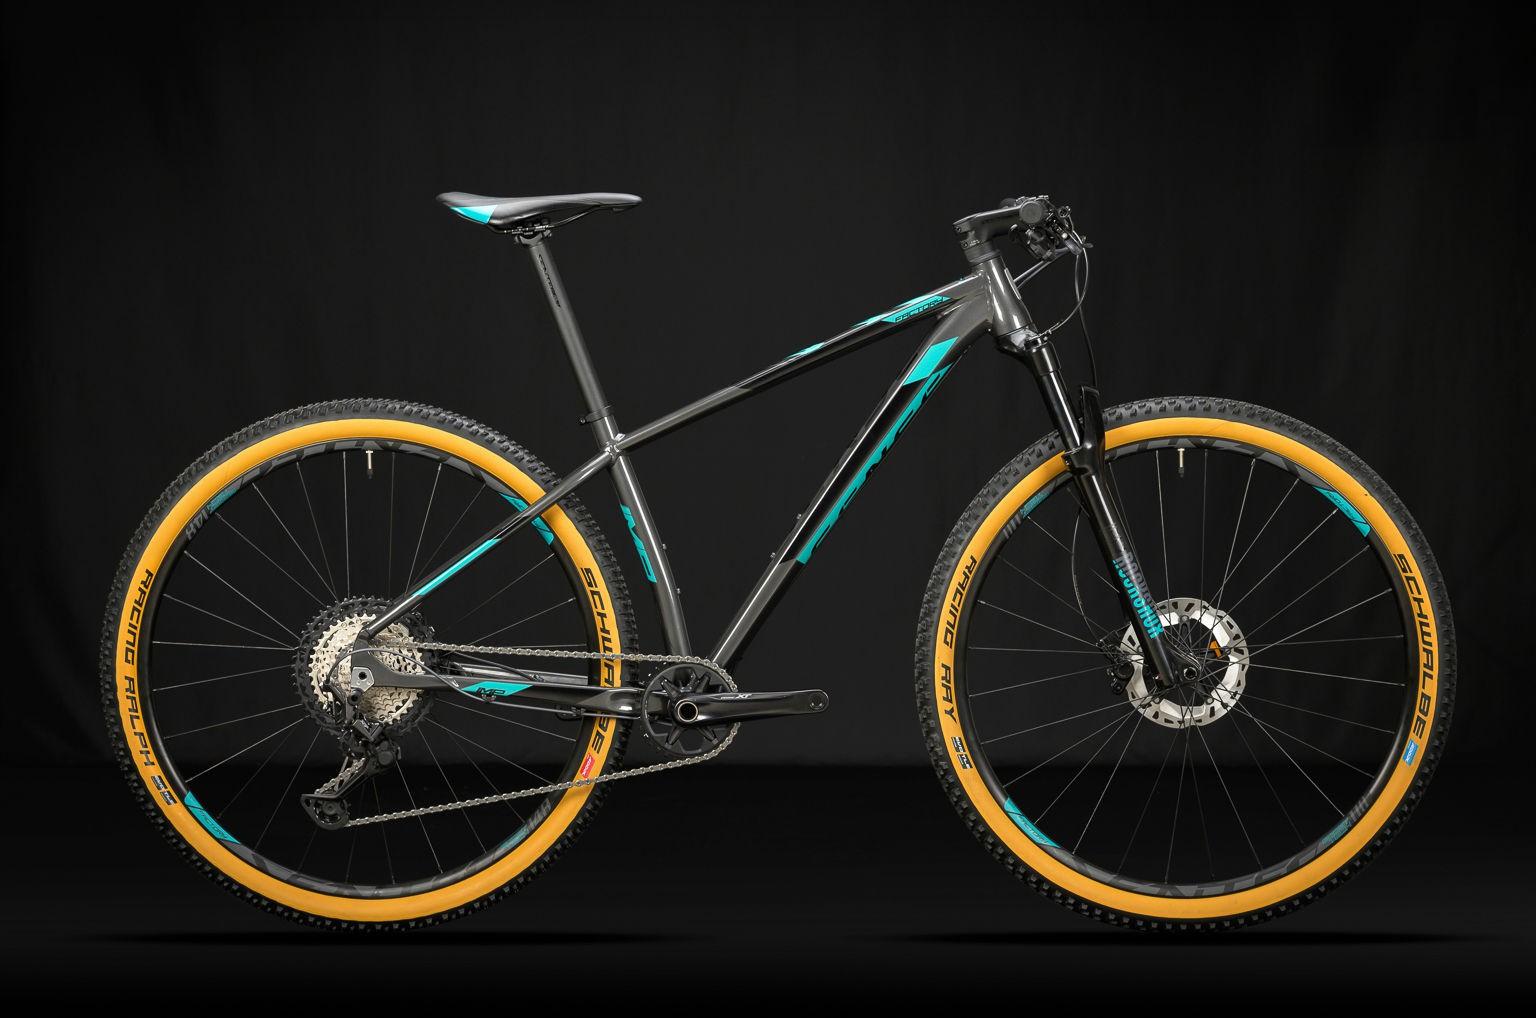 Bicicleta 29 Sense Impact Factory MTB XC 2020